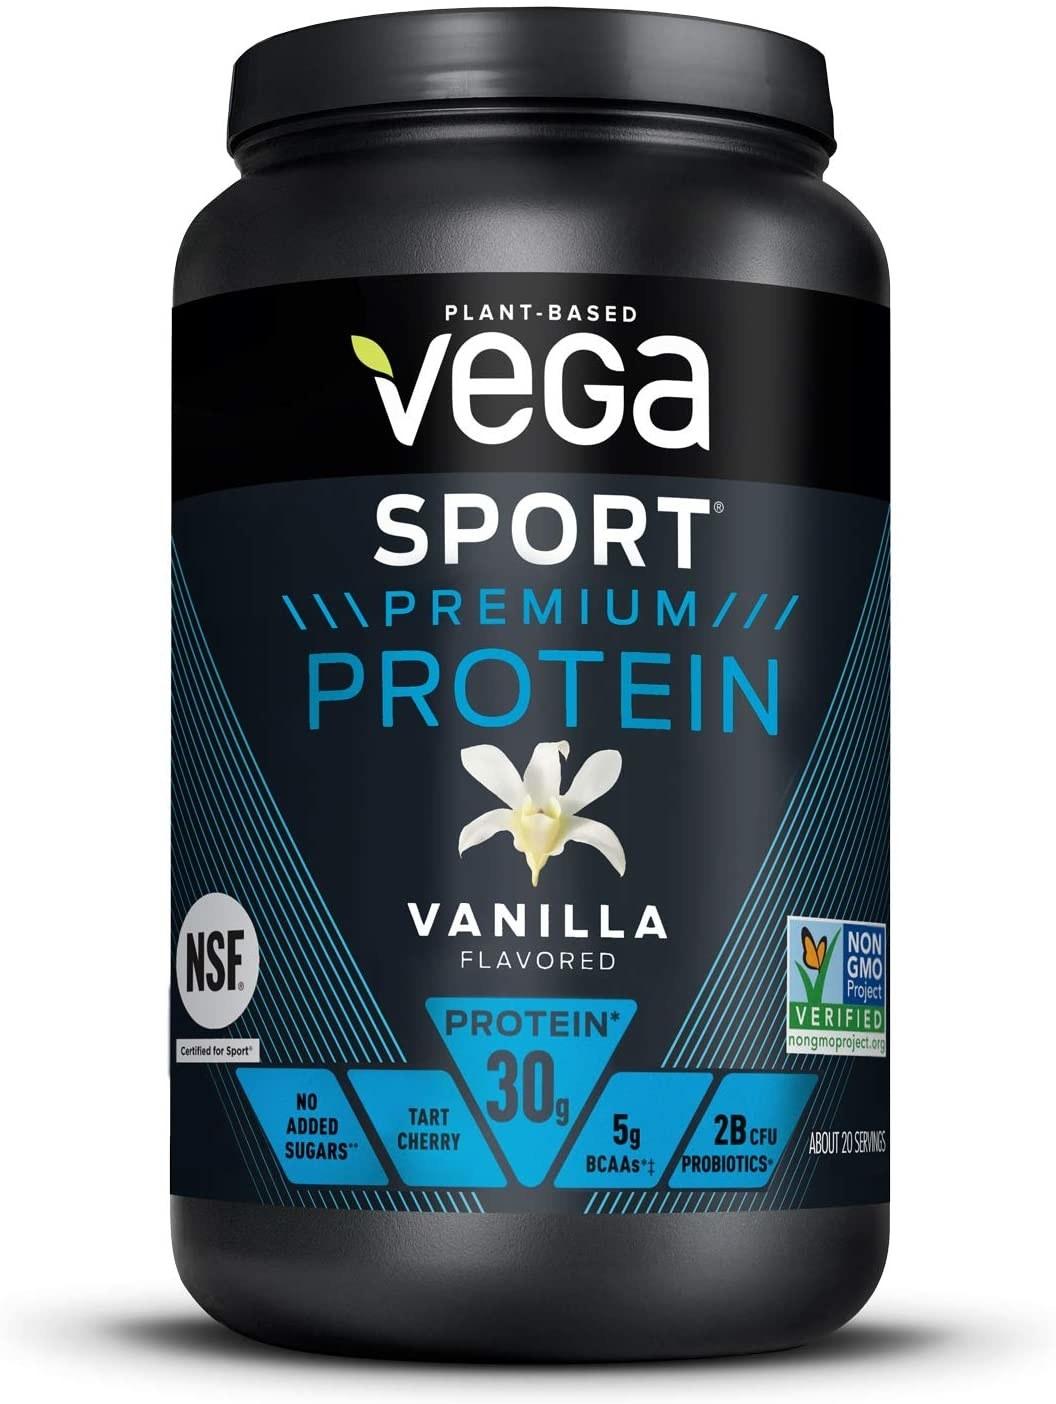 the black tub of protein powder